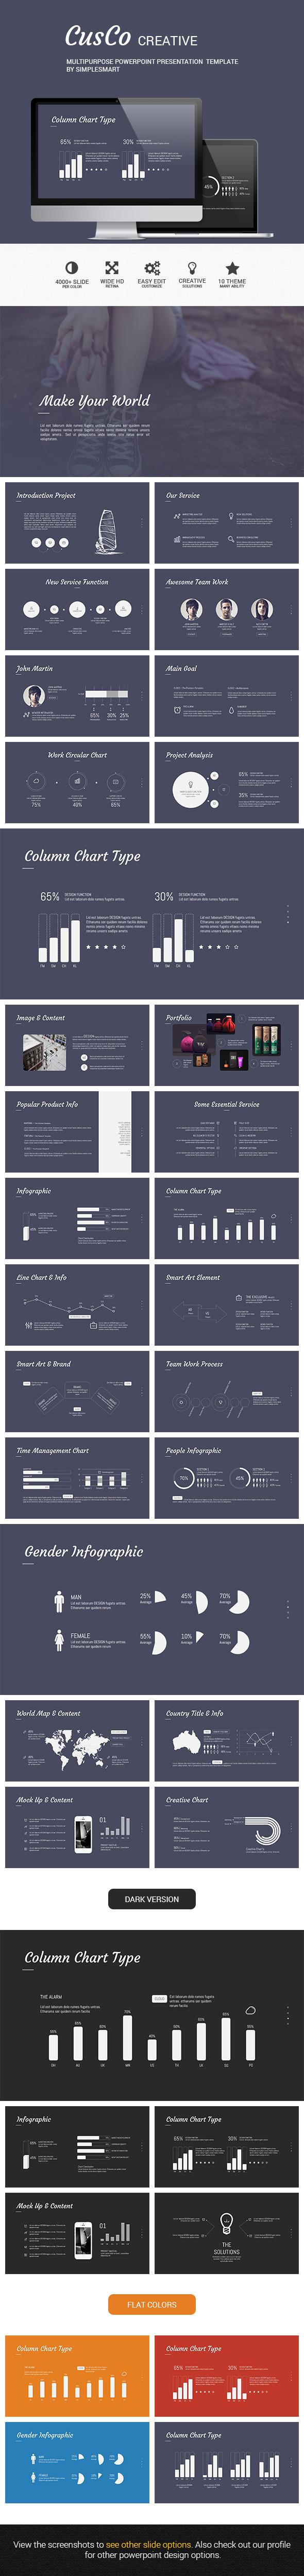 GraphicRiver CusCo Clean & Modern Presentation Template 8994265